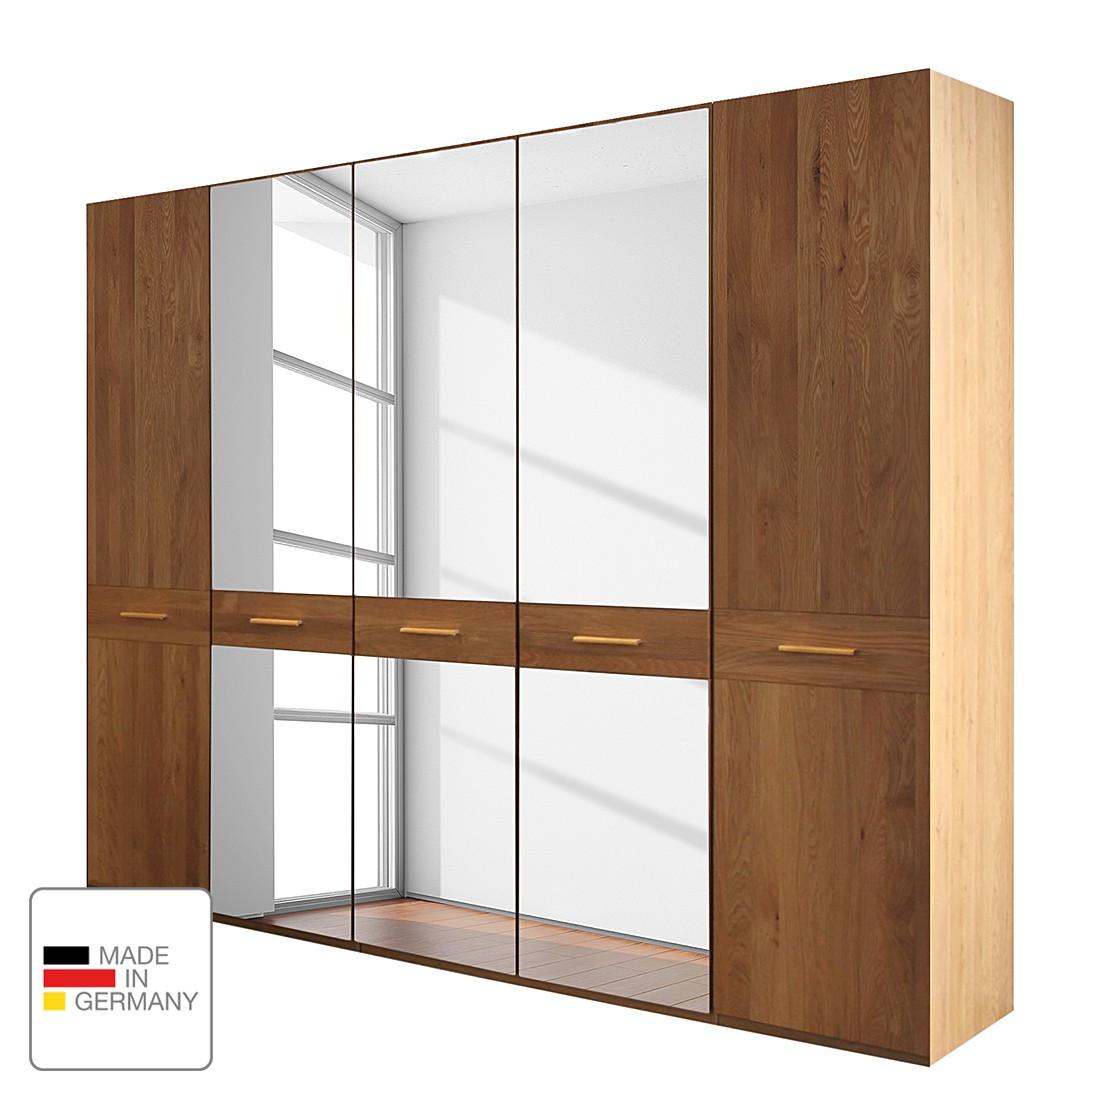 Draaideurkast Faro - gelakt deels massief eikenhout - 250cm (5-deurs) - 1 spiegeldeur - Zonder Passe-partout lijst, Wiemann